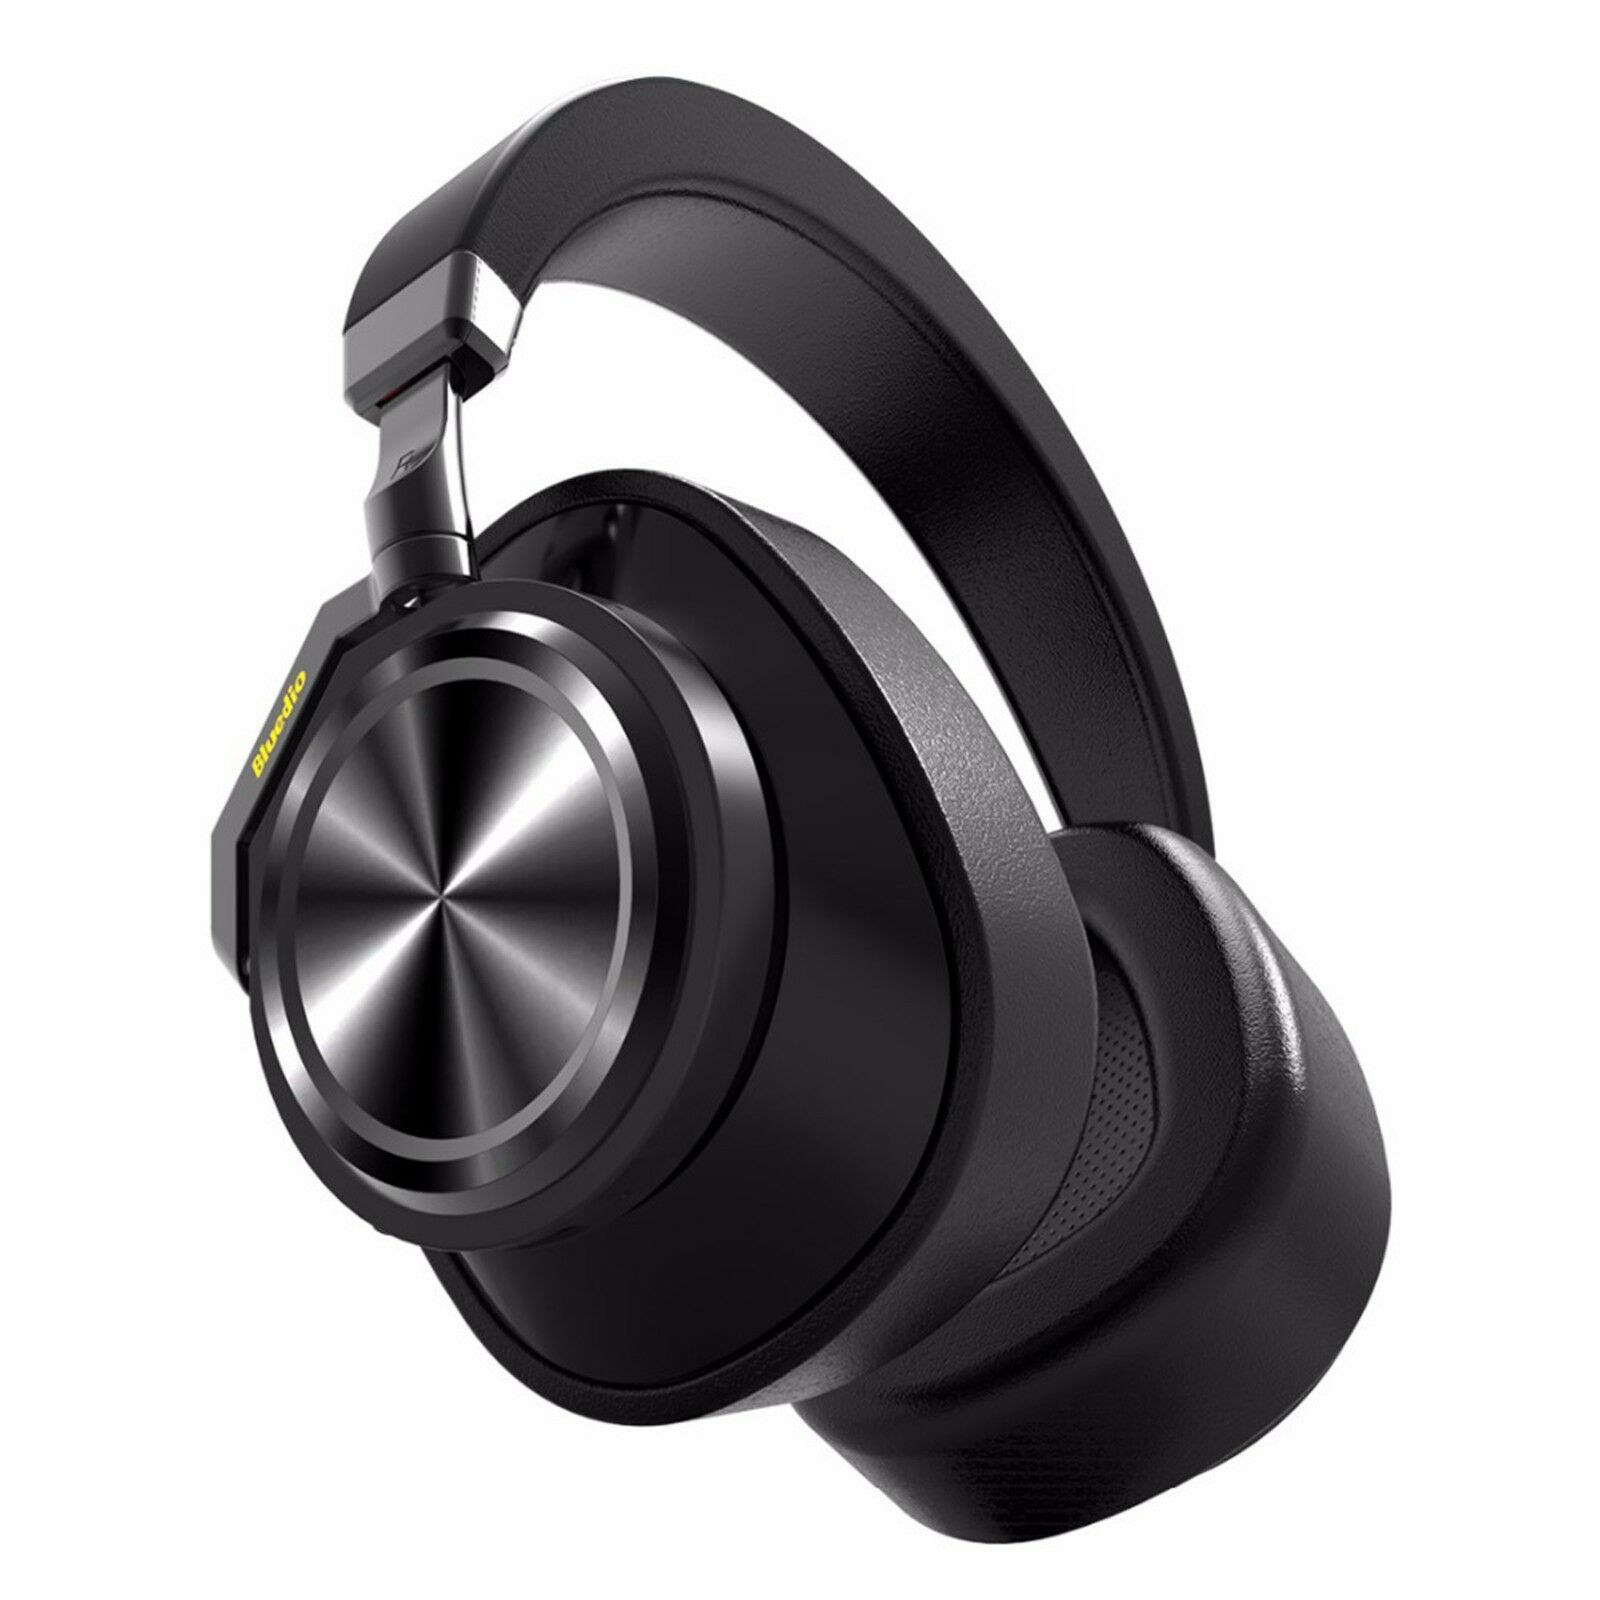 Bluedio T6 Bluetooth Cordless Stereo Headphones ANC wireless Headset, Microphone